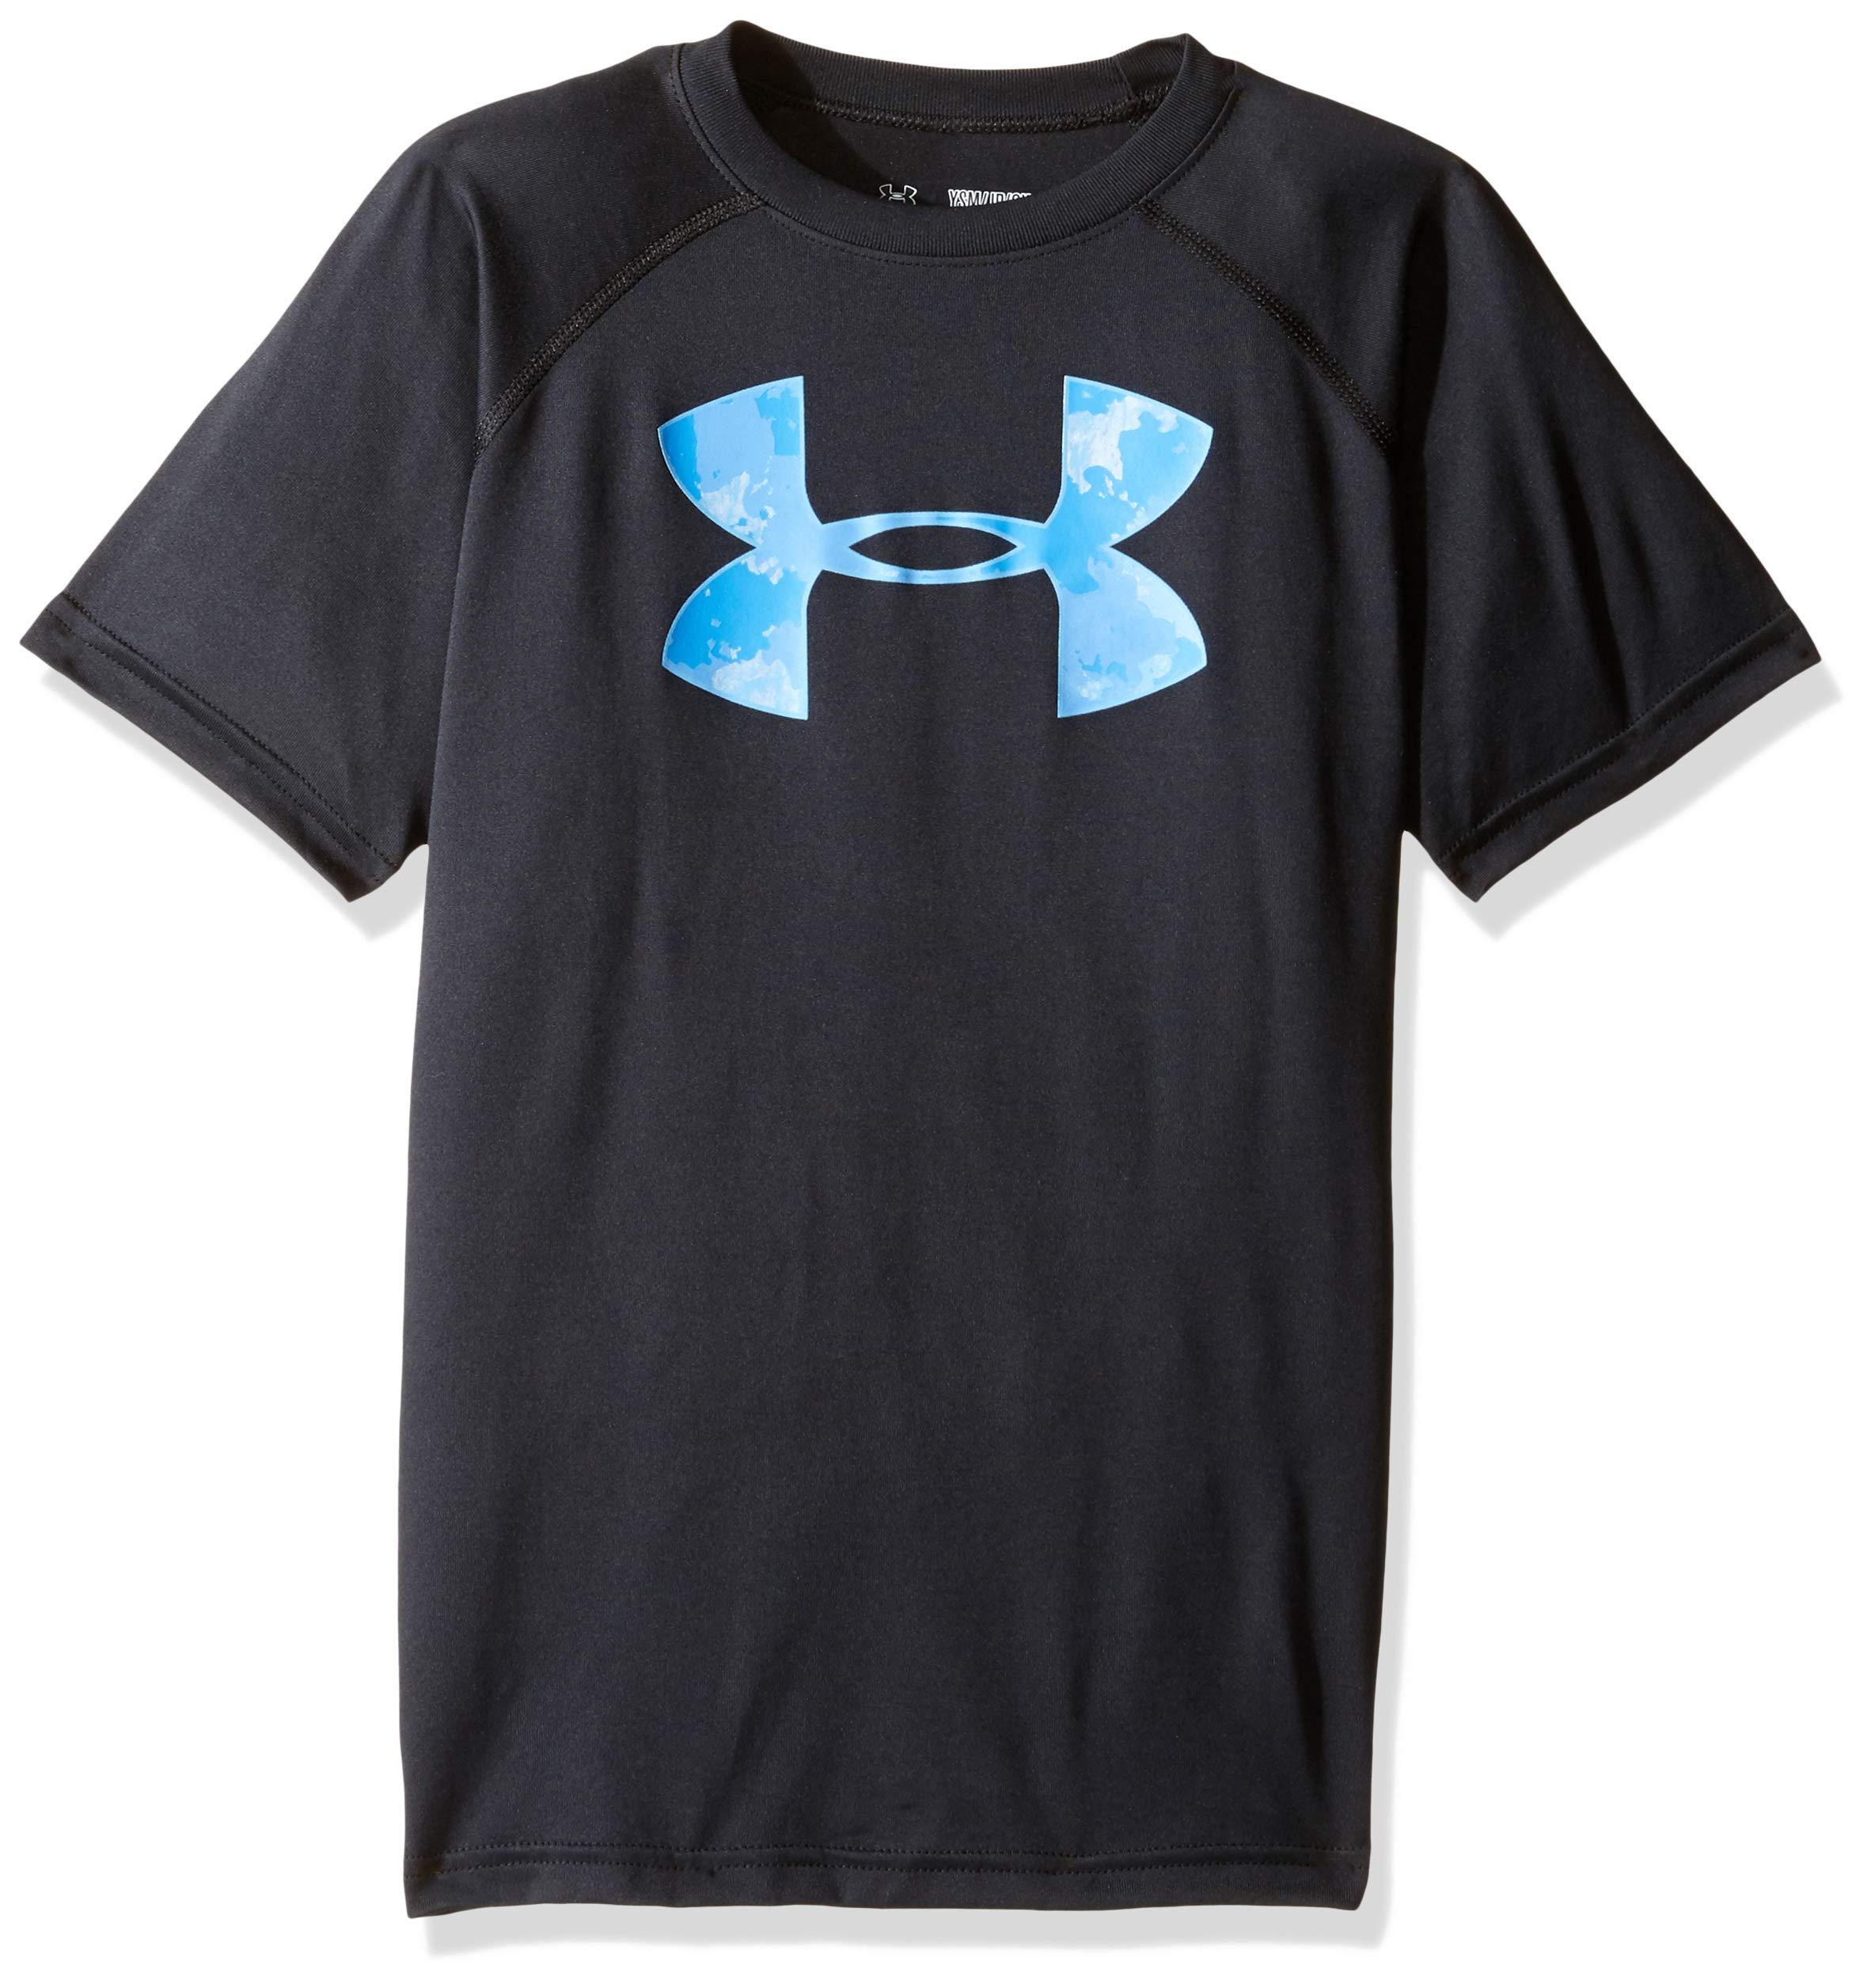 Under Armour Boys' Tech Big Logo T-Shirt, Black /Carolina Blue, Youth X-Small